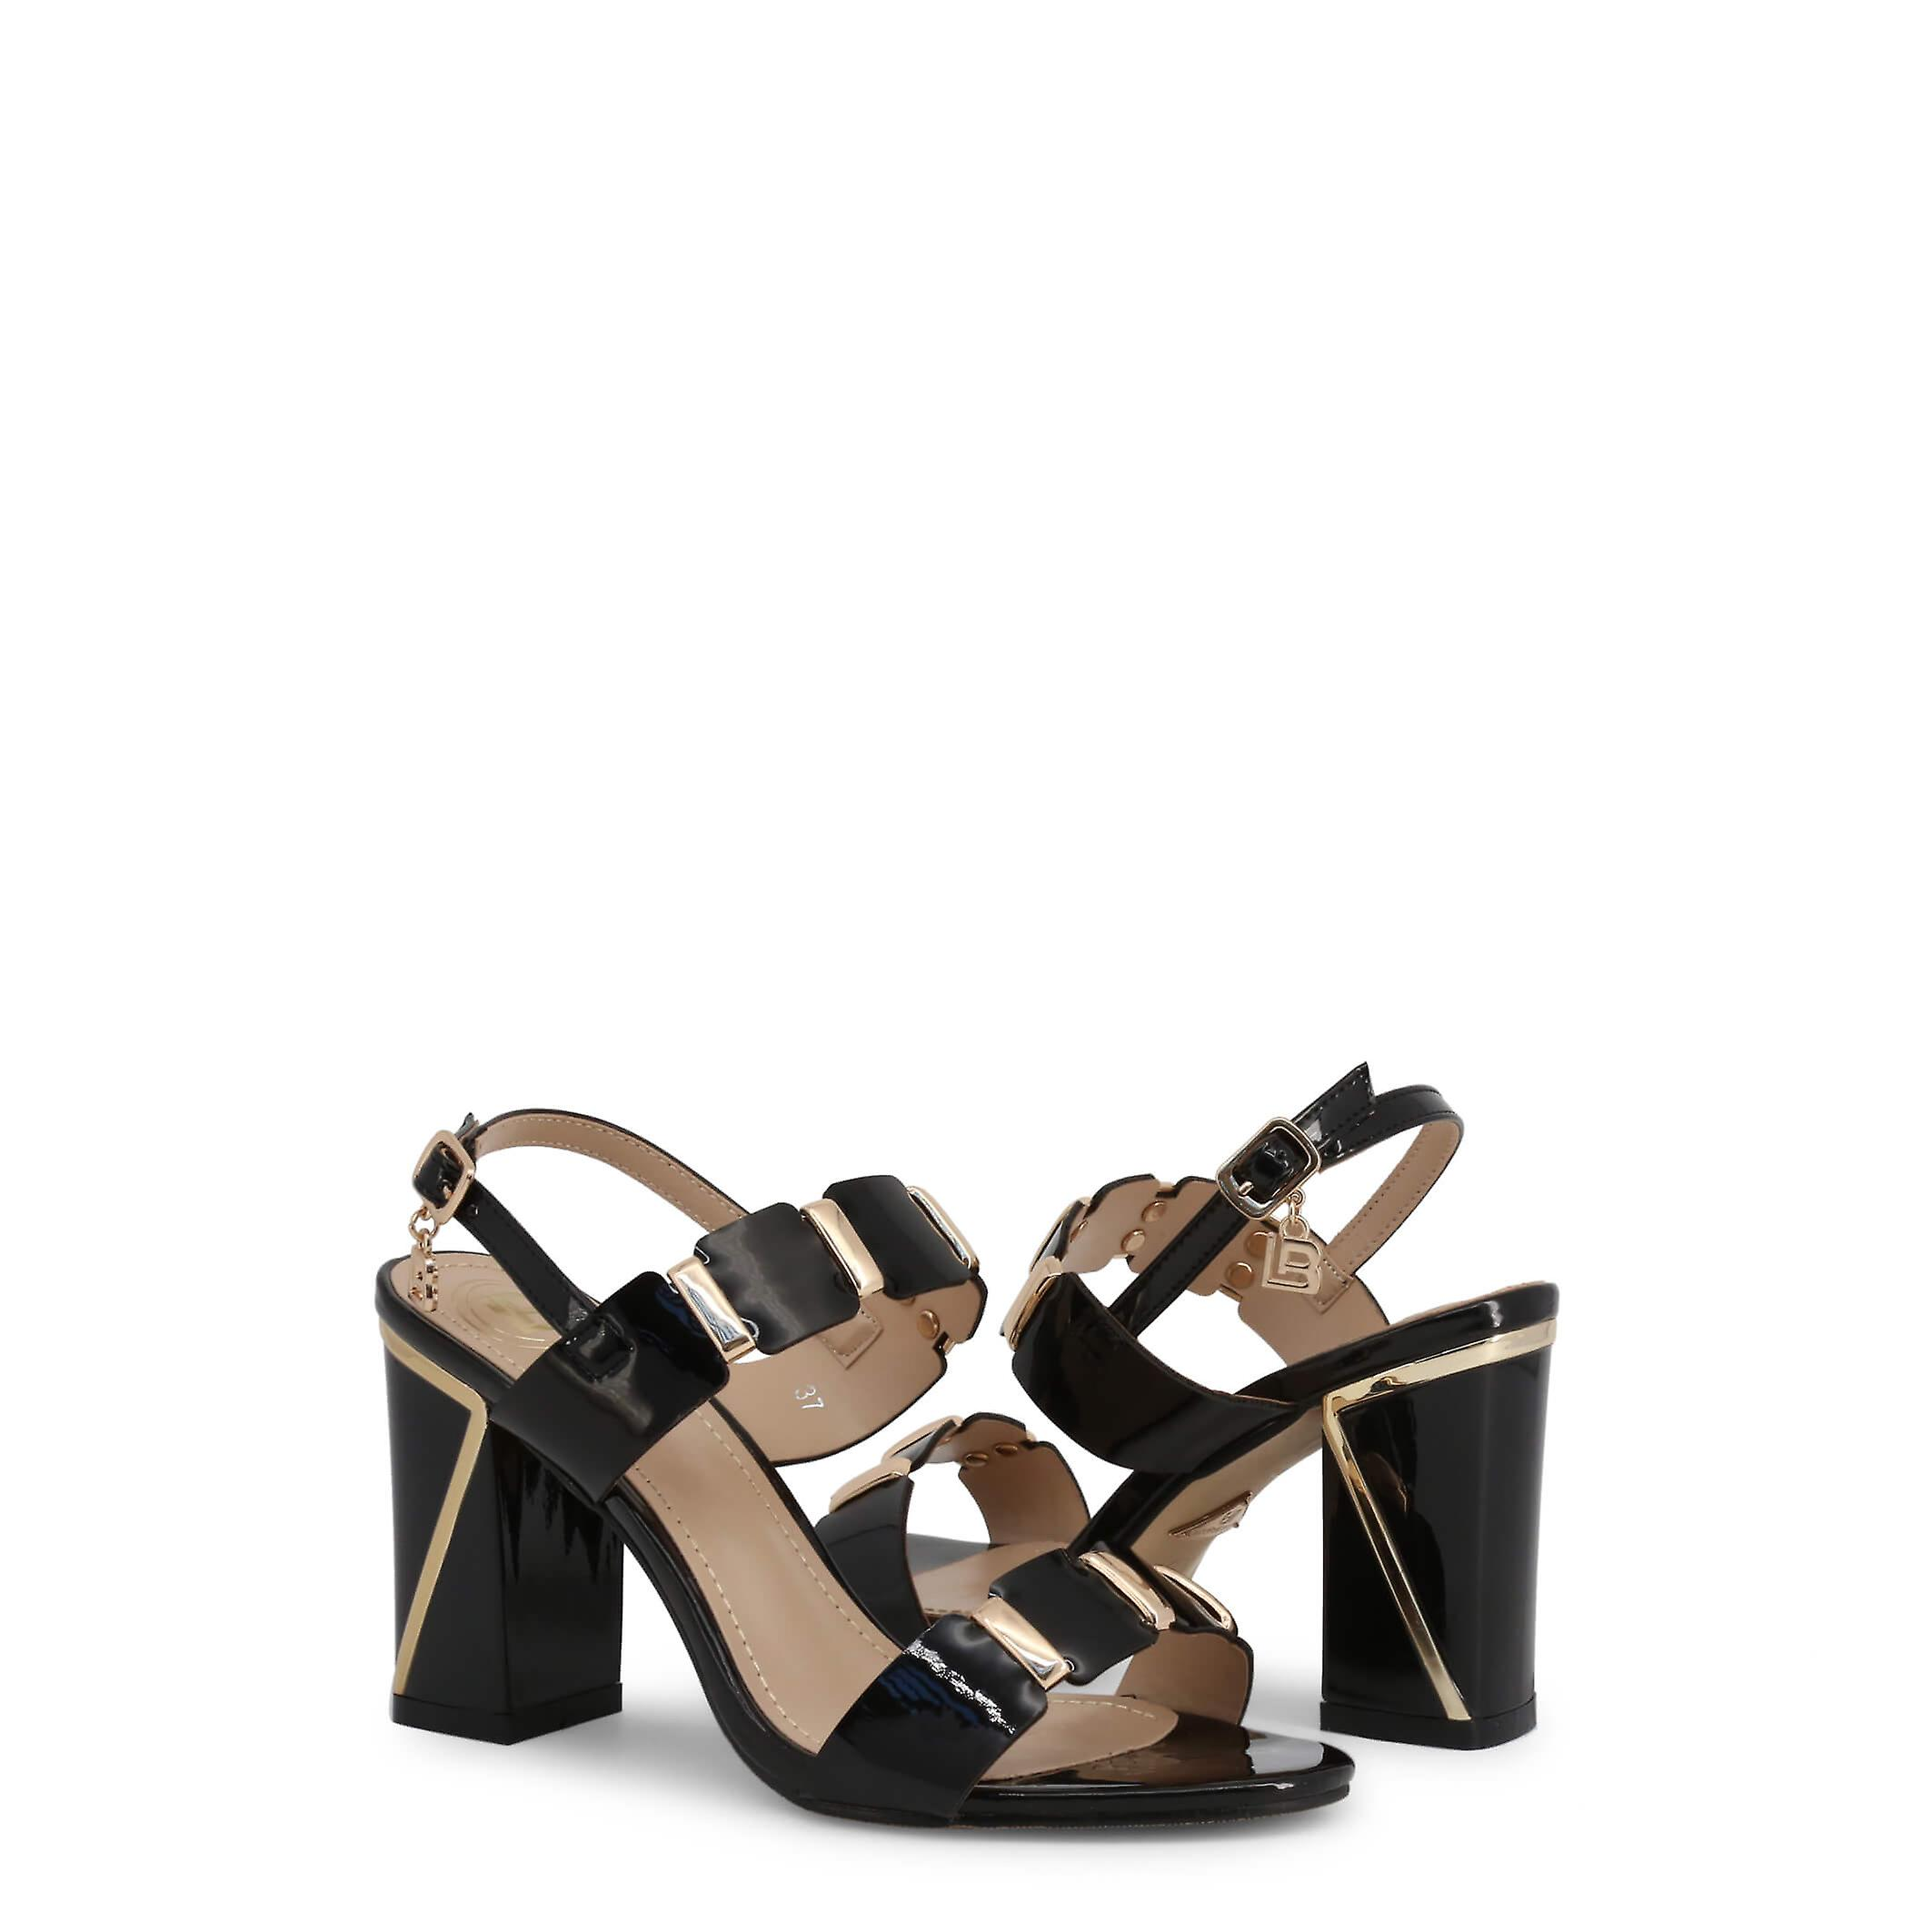 Laura Biagiotti Original Women Spring/summer Sandals - Black Color 41395